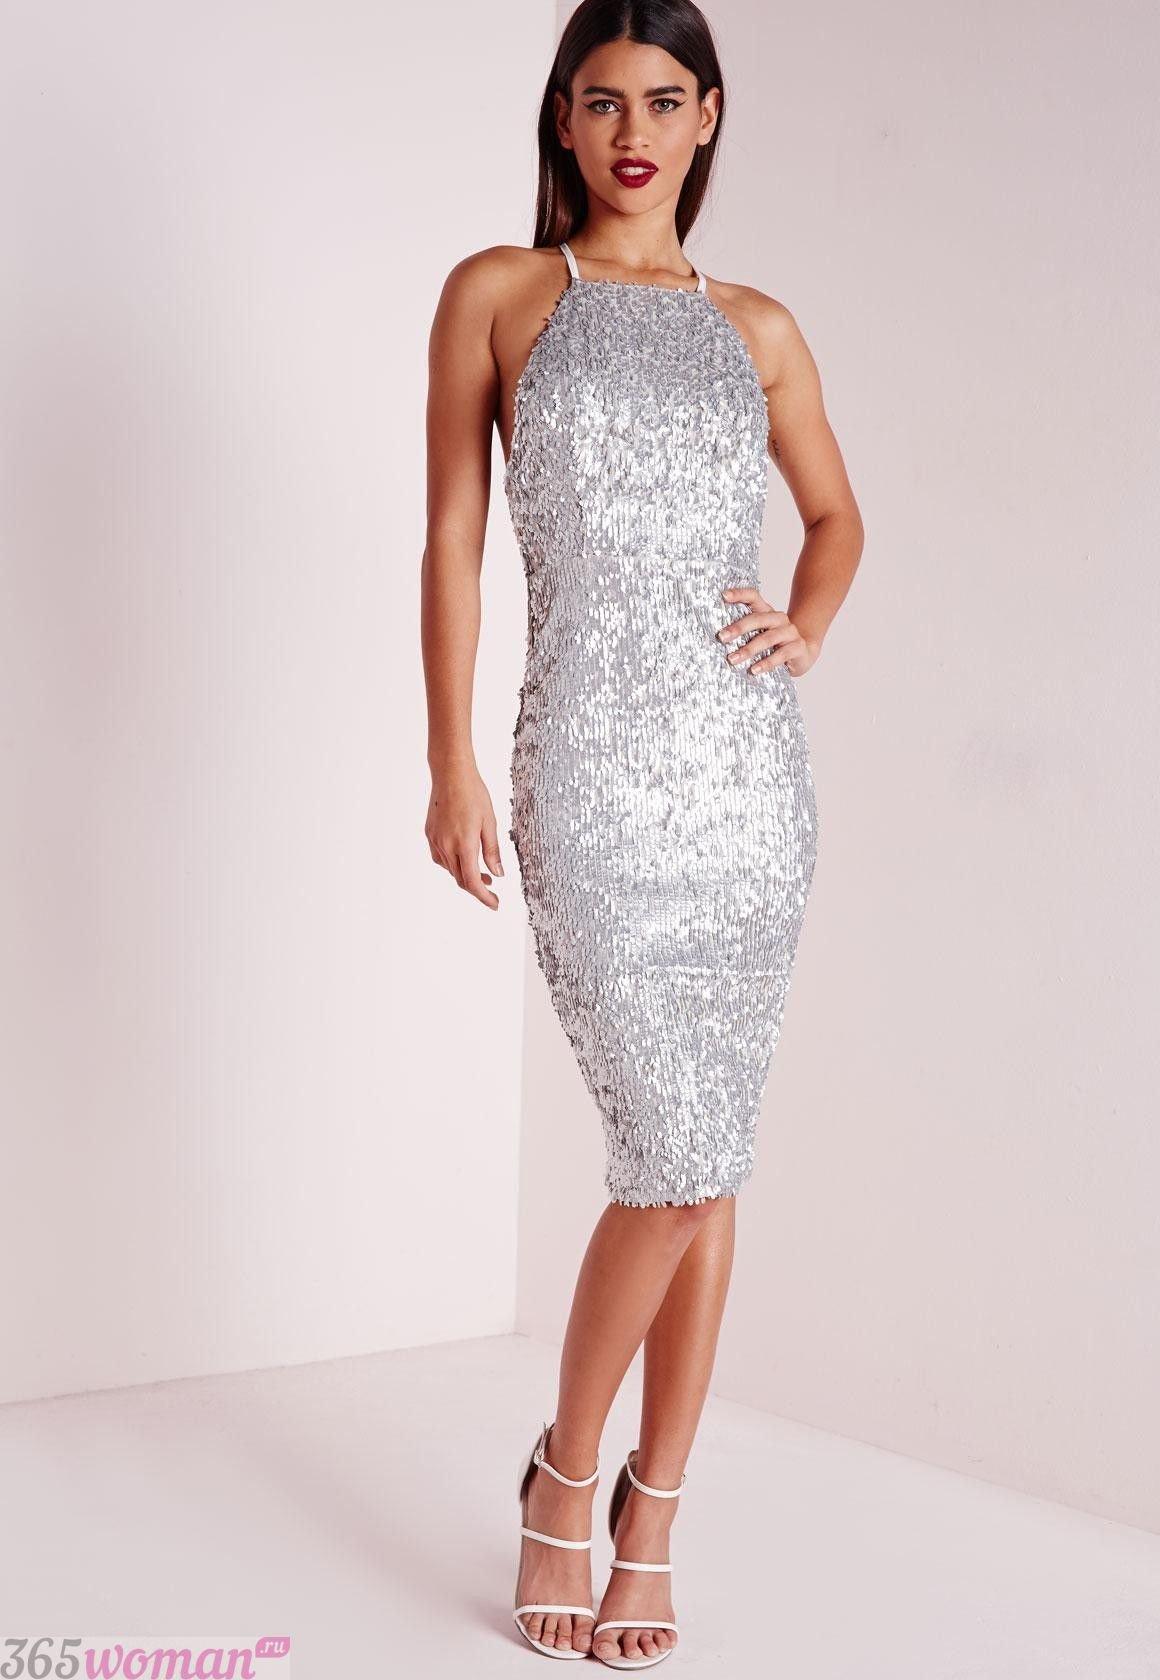 Что одеть на новогодний корпоратив 2020: серебристое платье футляр без рукавов